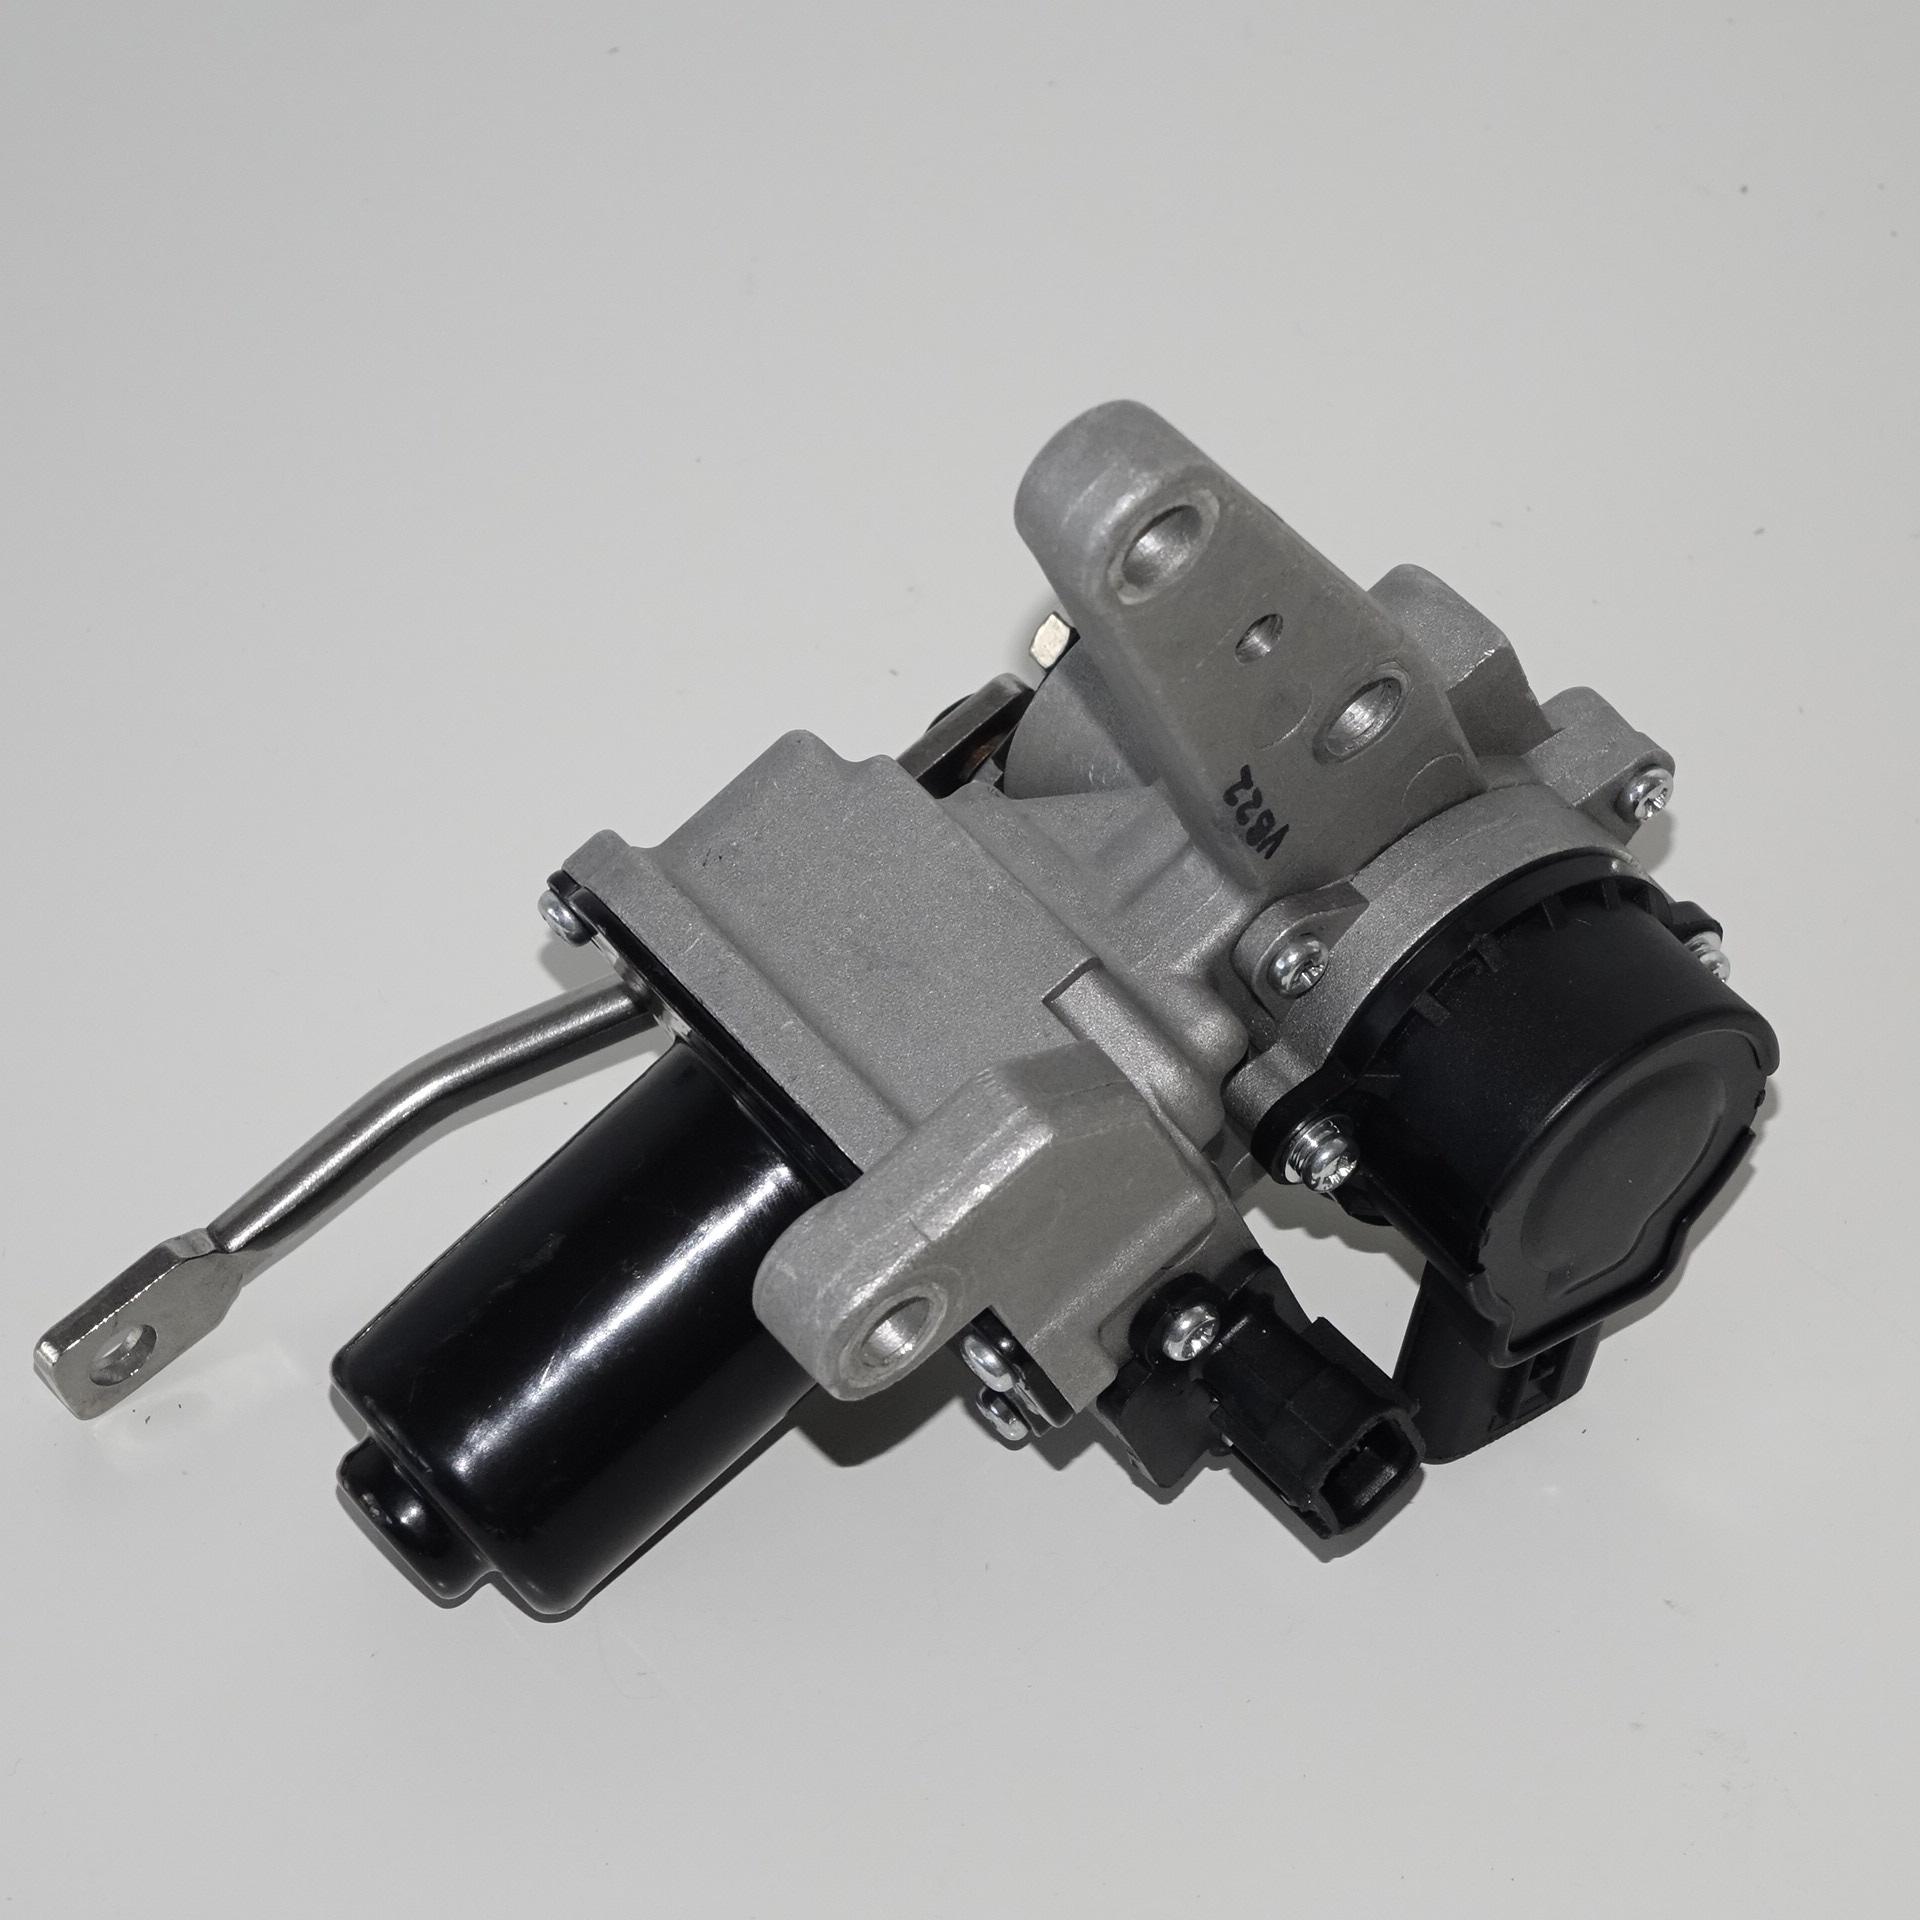 toyota-land-cruiser-1vd-ftv-vb22-vb36-electronic-actuator-stepper-motor